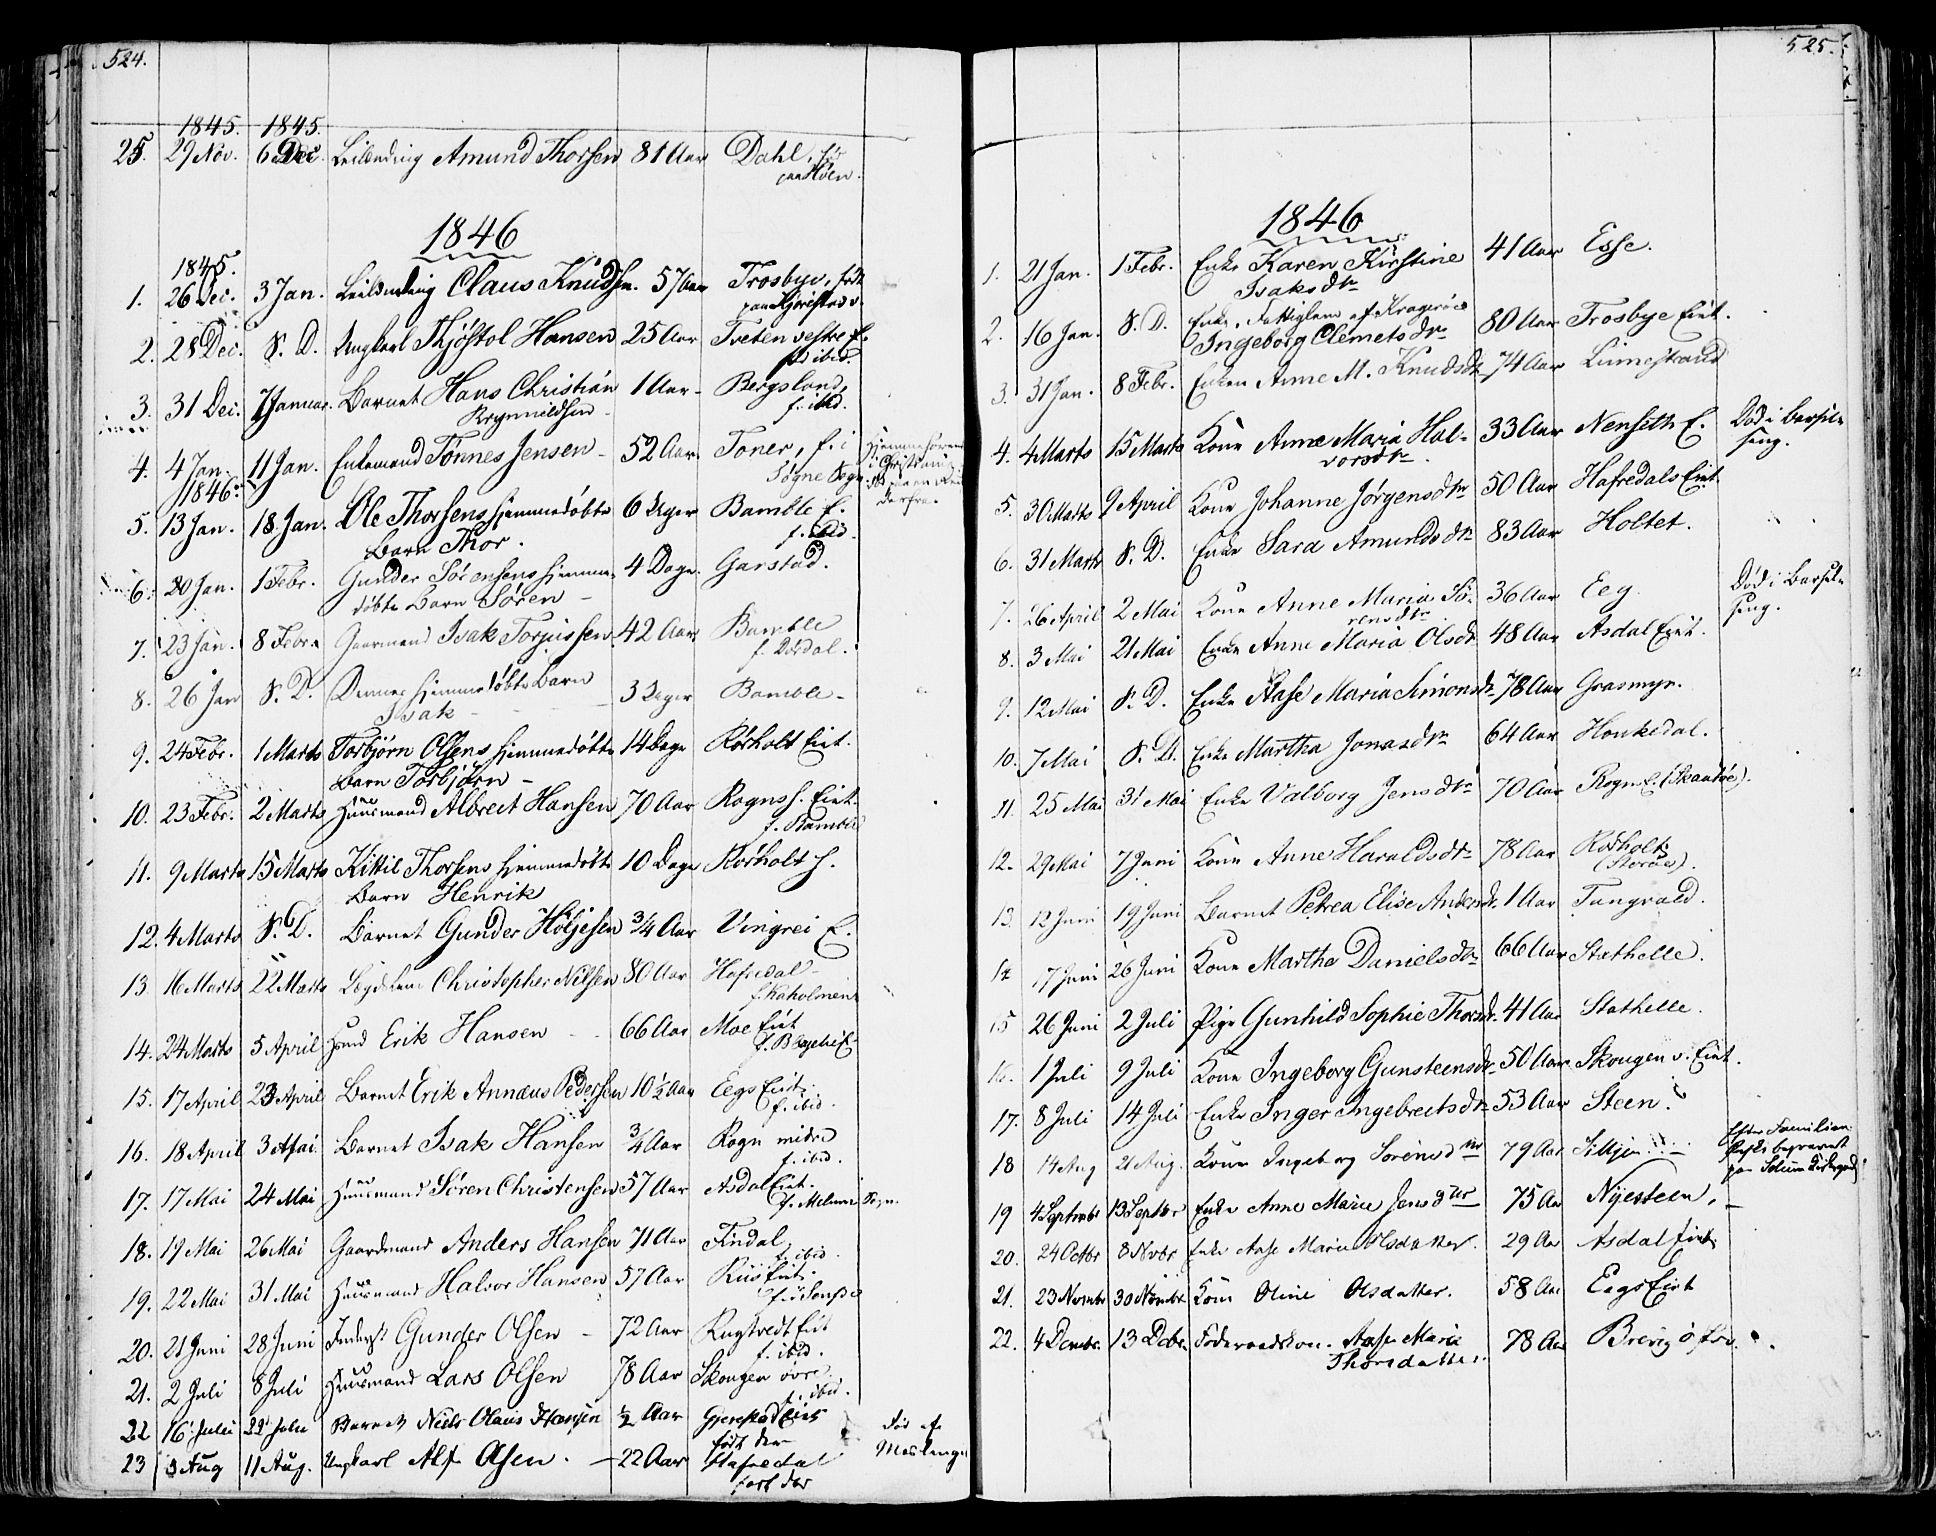 SAKO, Bamble kirkebøker, F/Fa/L0004: Ministerialbok nr. I 4, 1834-1853, s. 524-525